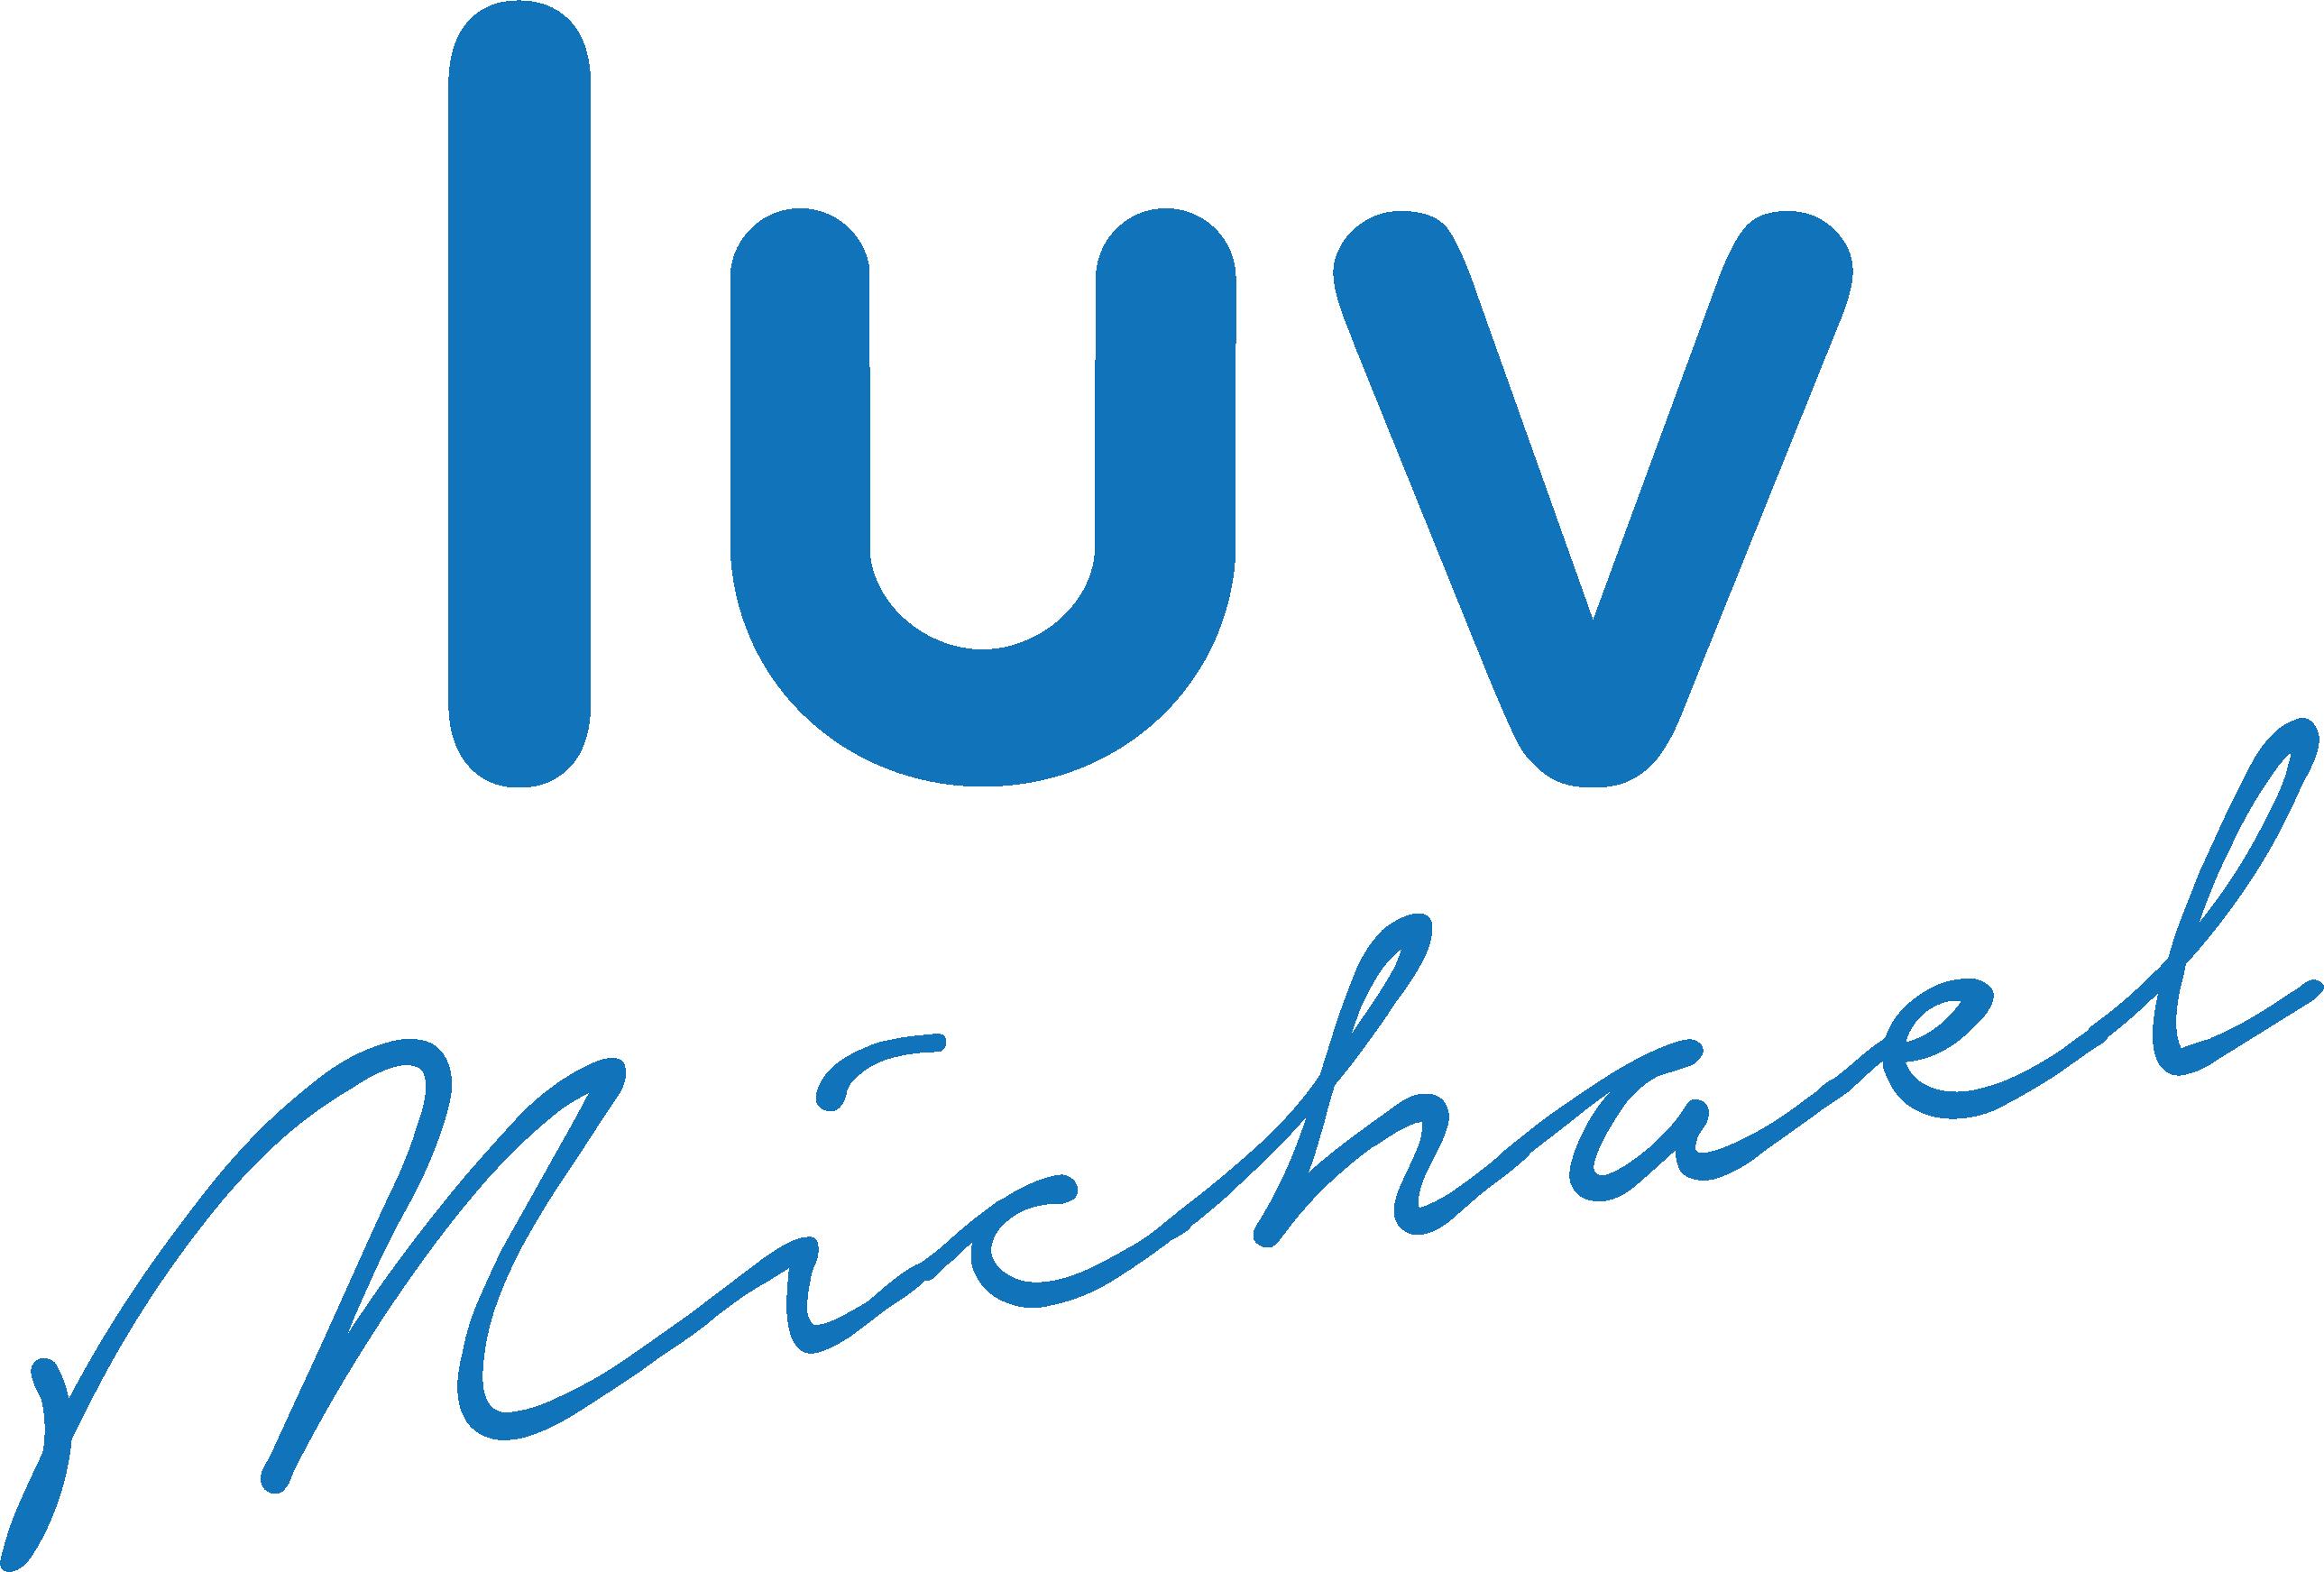 Community Service Organization Luv Michael: Virtual Fundraising to Benefit Autism